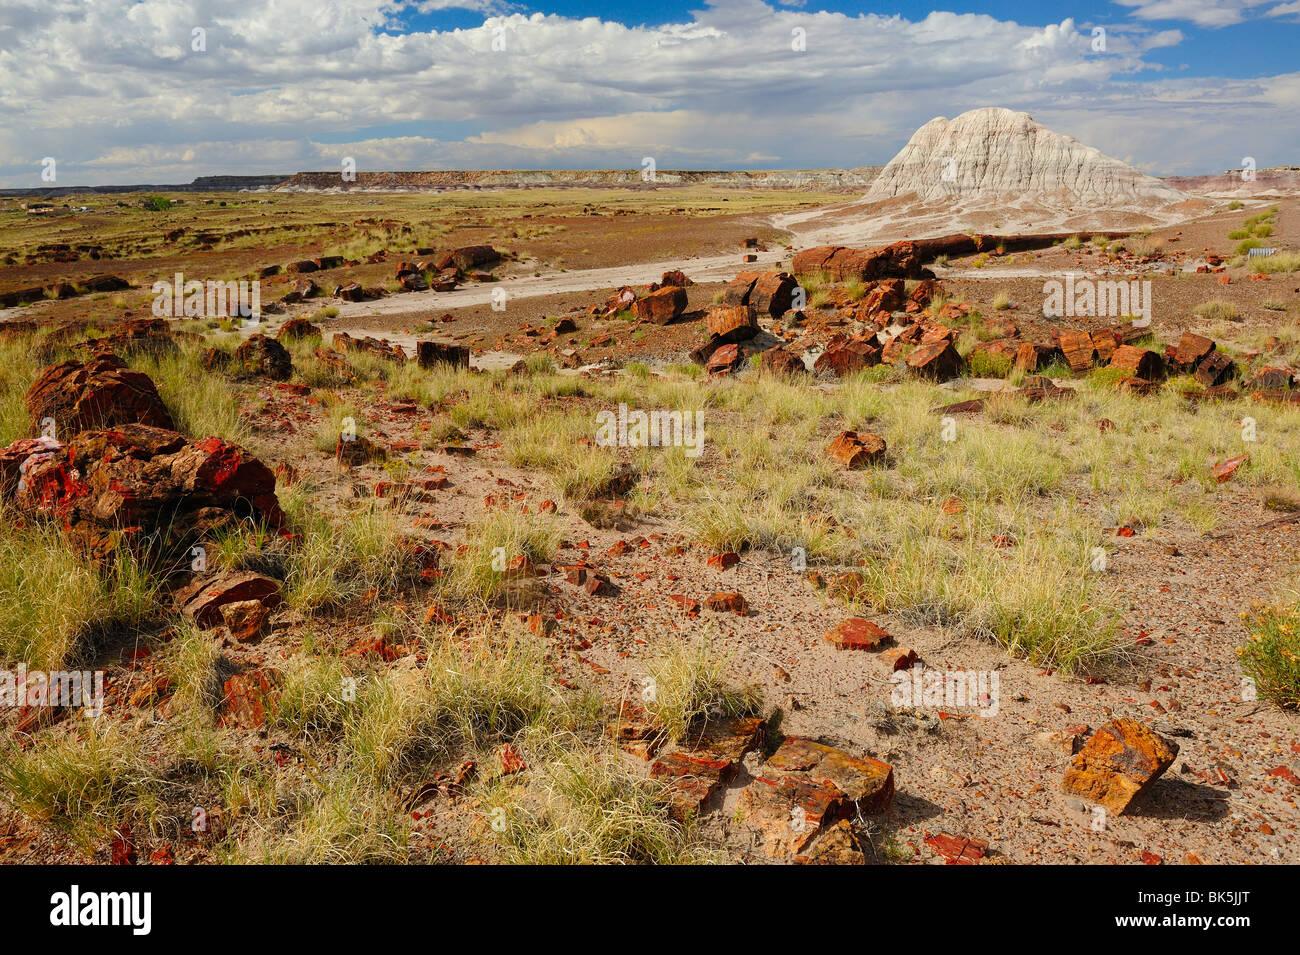 Scenic view on Petrified Forest National Park, Arizona, USA - Stock Image